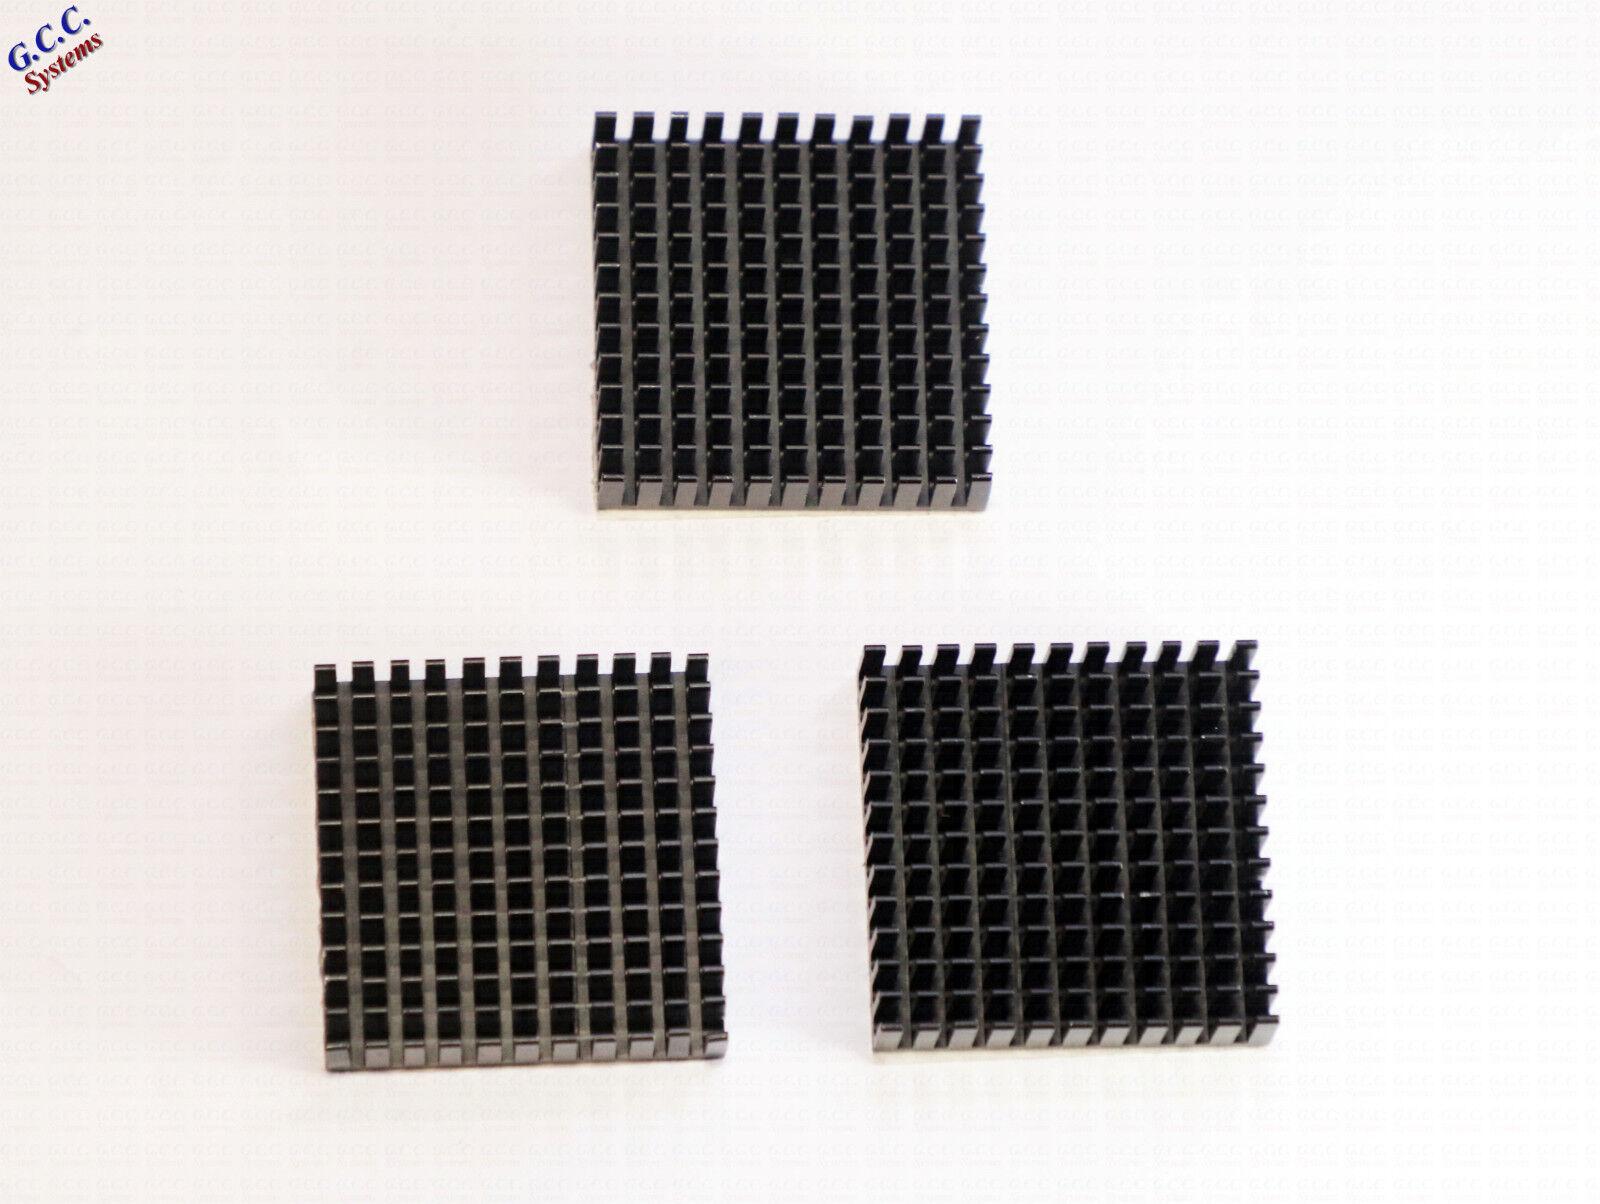 3x 3D Printer NEMA17 42 Stepper Motor Heatsinks With Thermal Adhesive Backing